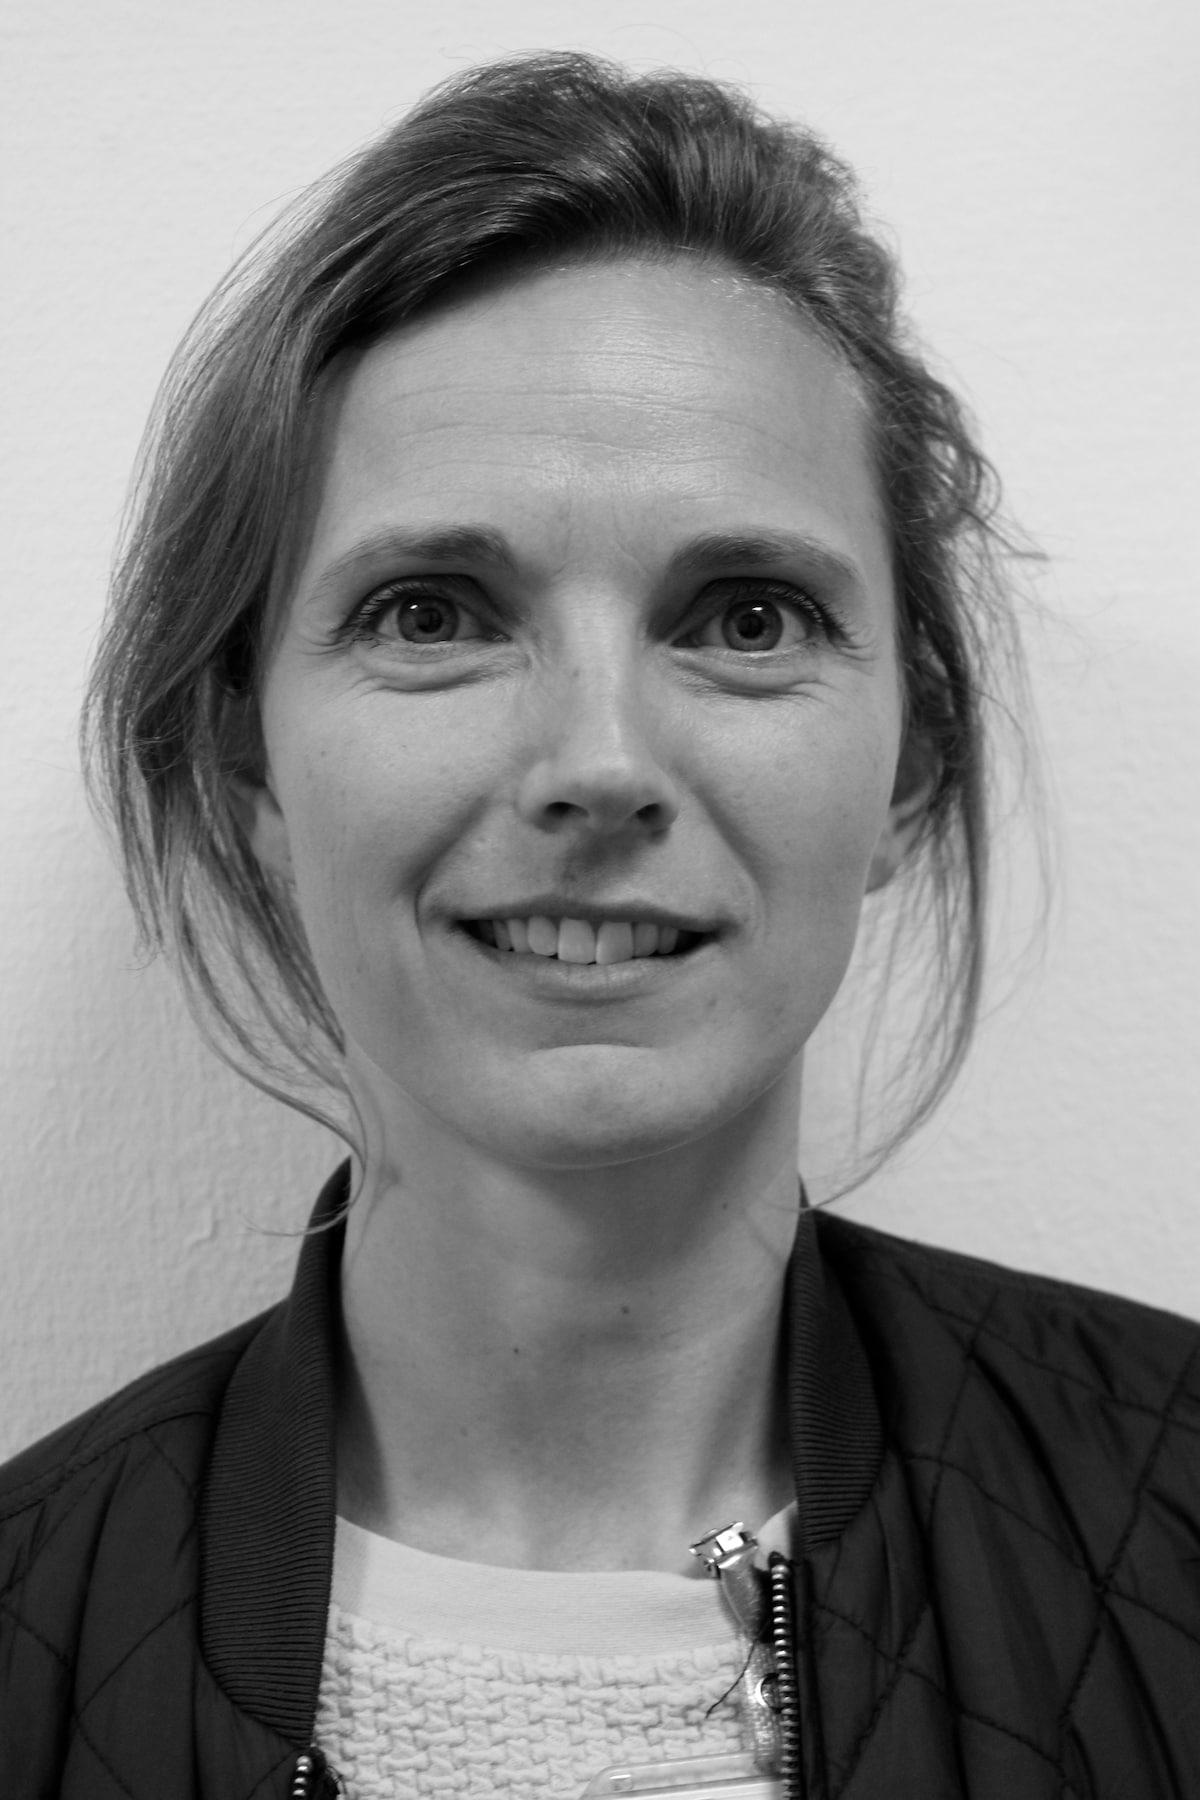 Sofie from Nykøbing Sjælland